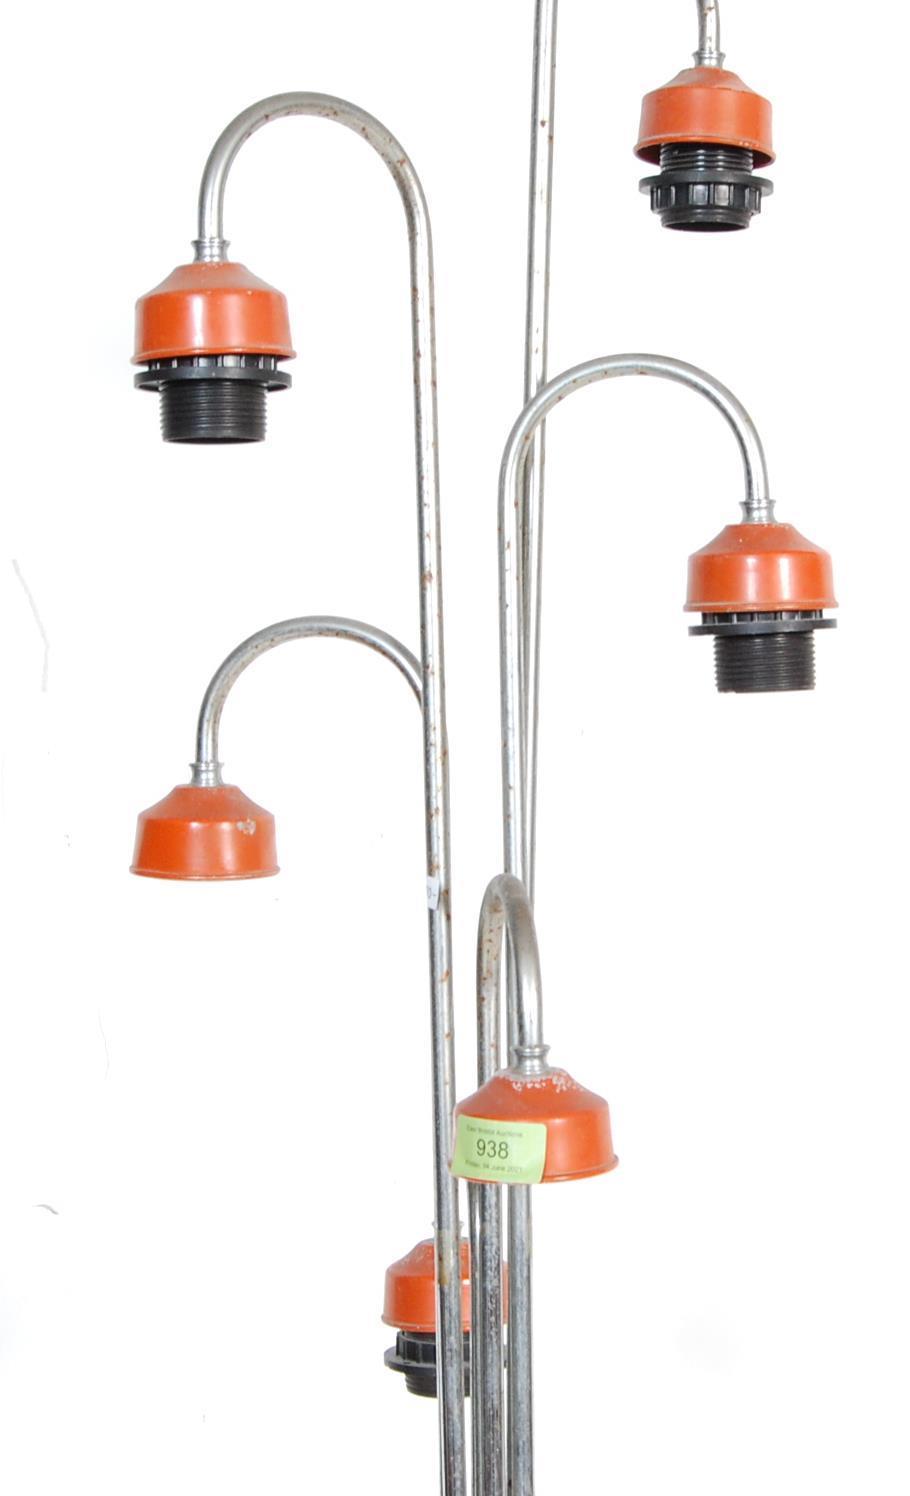 RETRO VINTAGE MID 20TH CENTURY STANDARD LAMPS - Image 2 of 4